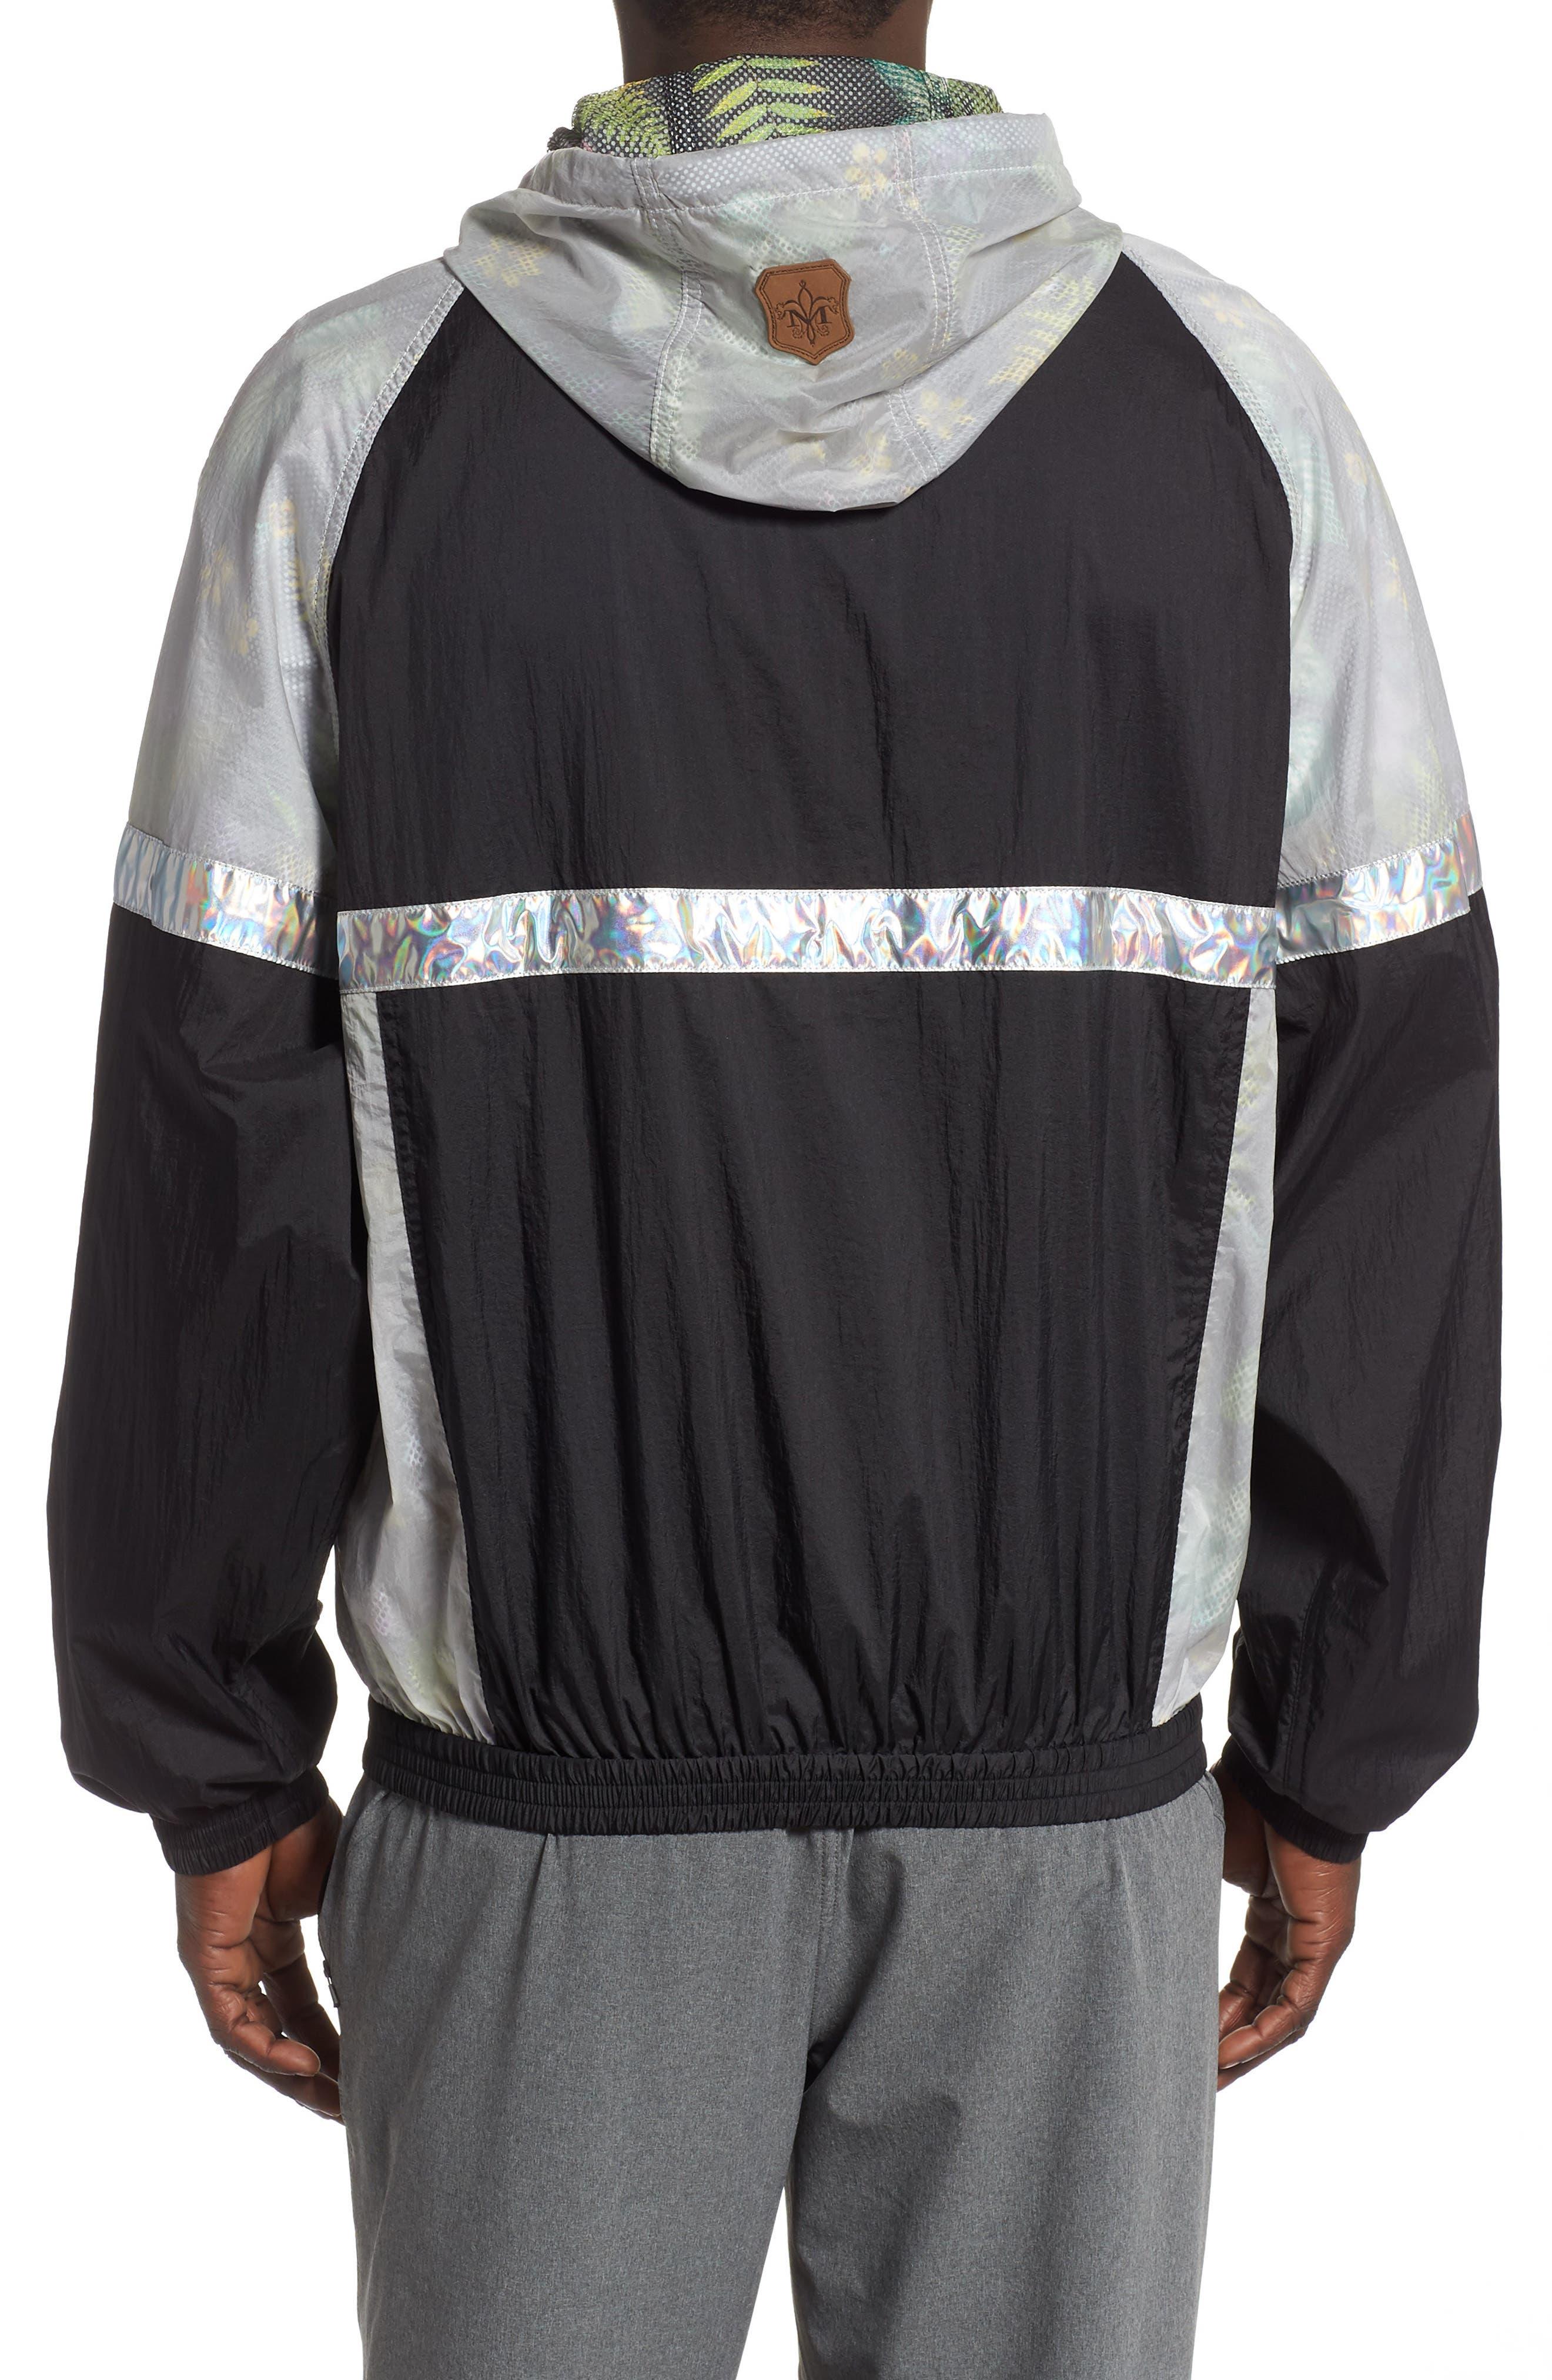 MACKAGE, Axel Hooded Rain Jacket, Alternate thumbnail 2, color, MULTI